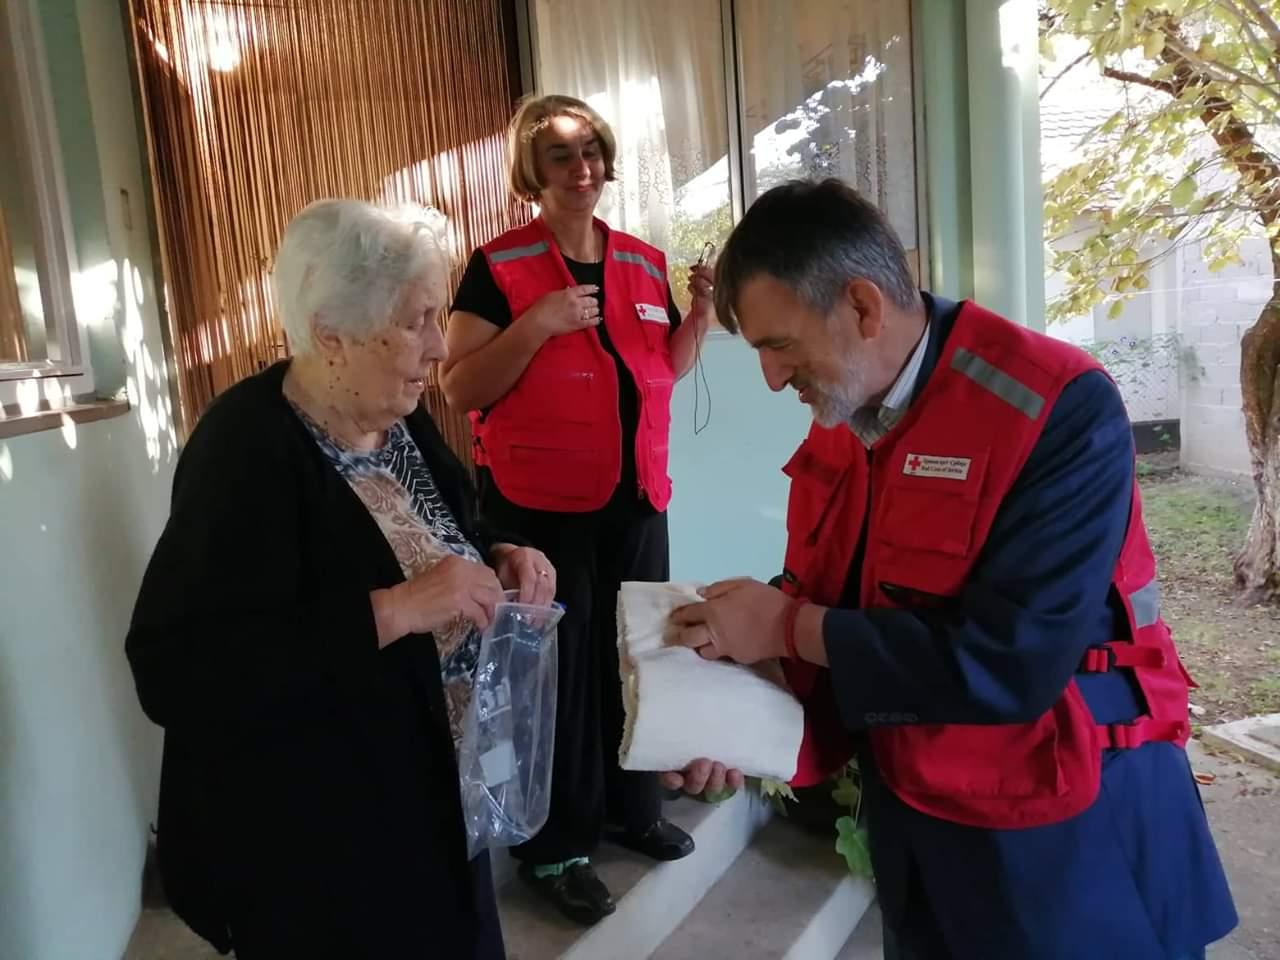 Crveni krst Požarevac: 1. oktobar - Međunarodni dan starijih osoba 23937